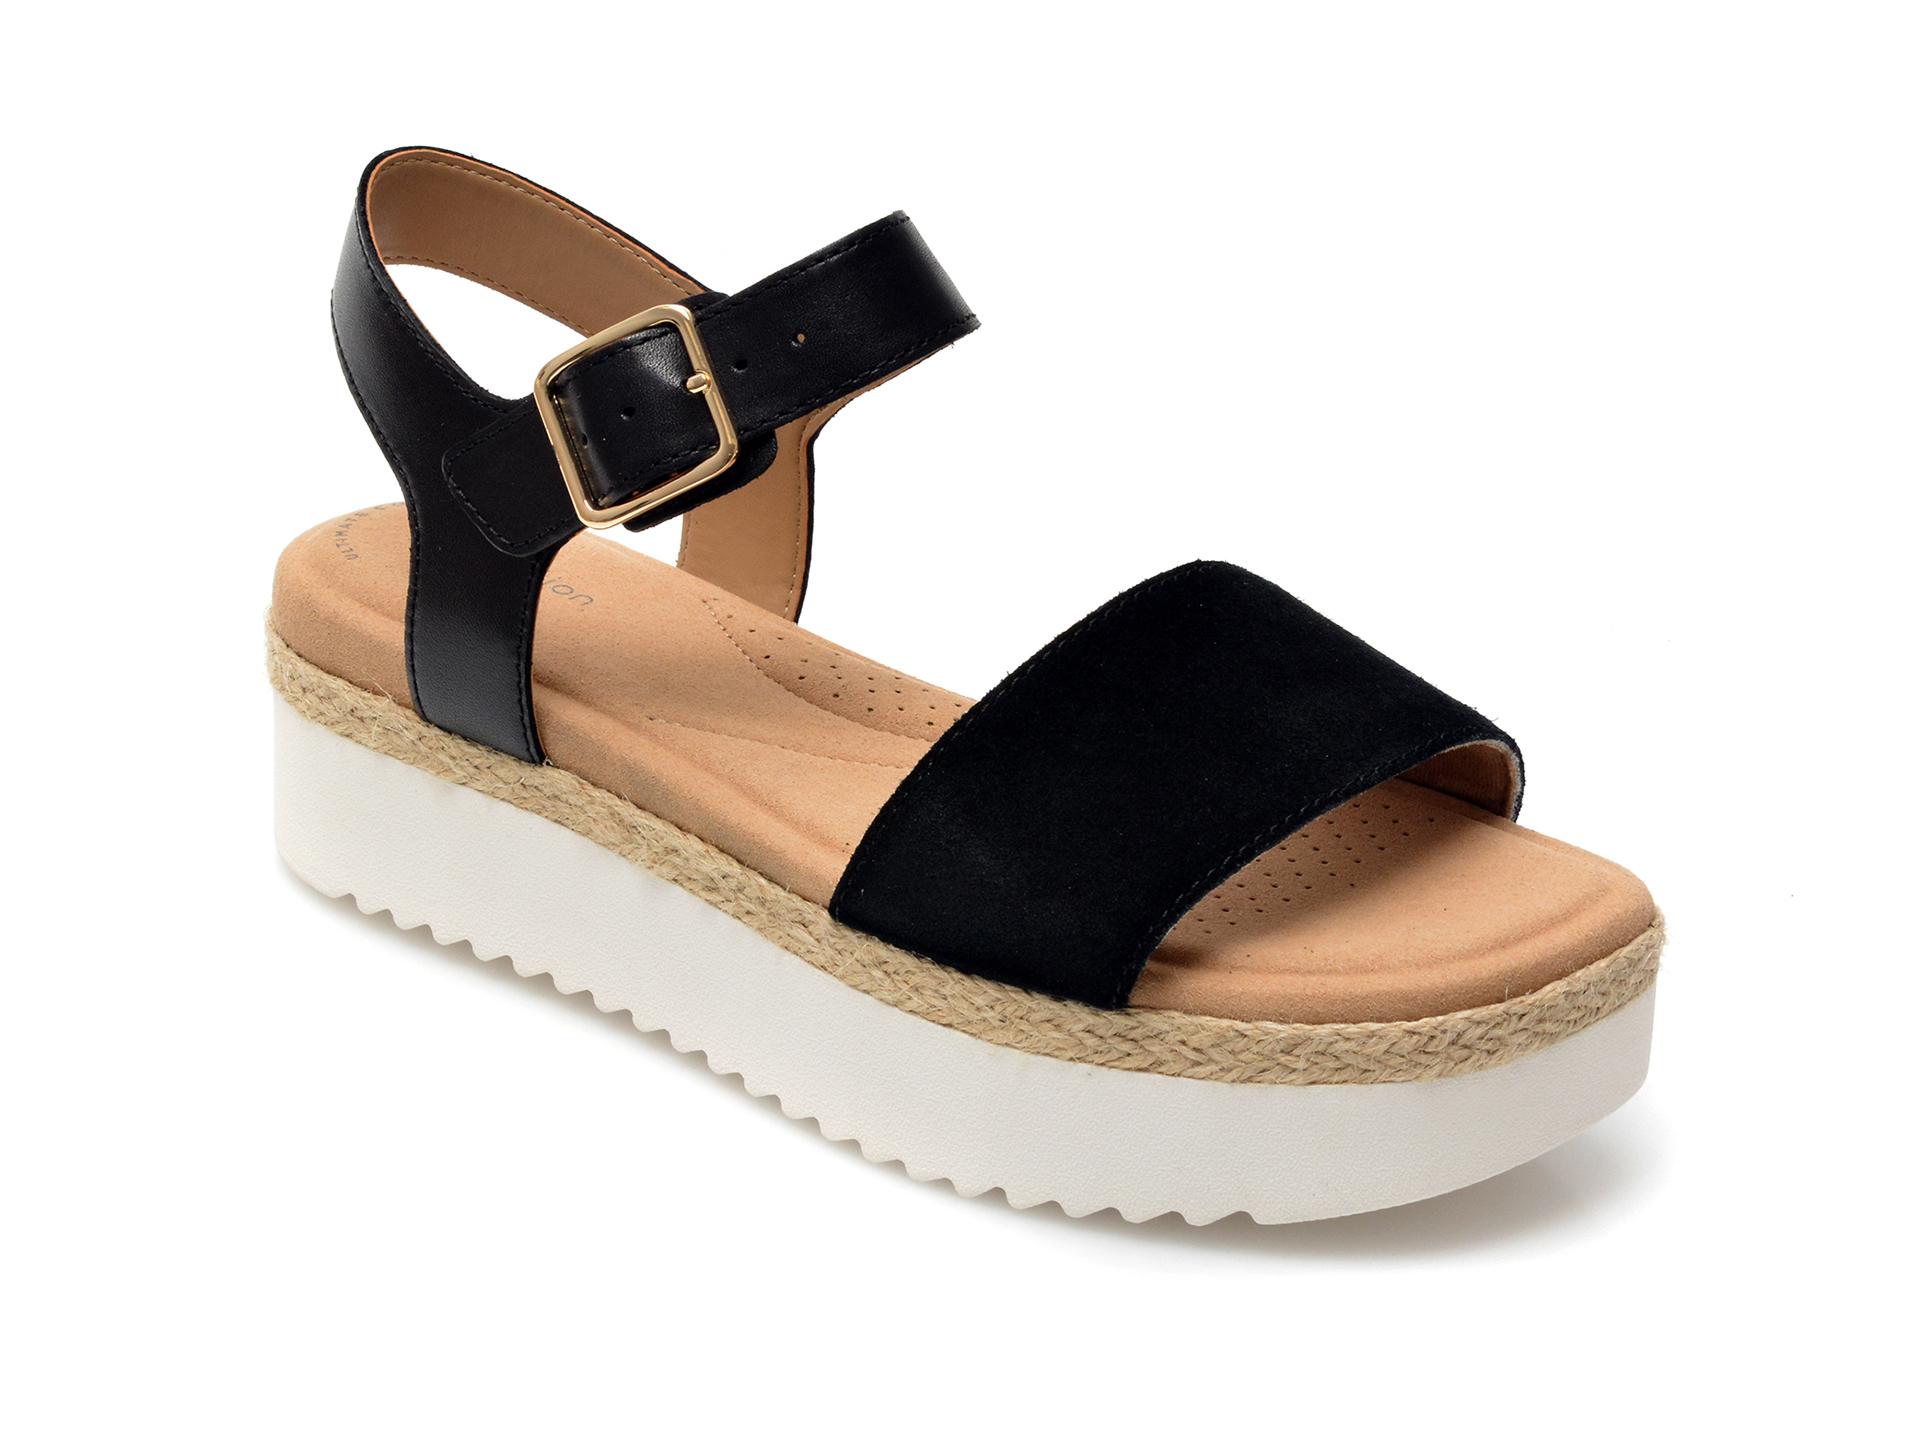 Sandale CLARKS negre, Lana Shore, din piele intoarsa imagine otter.ro